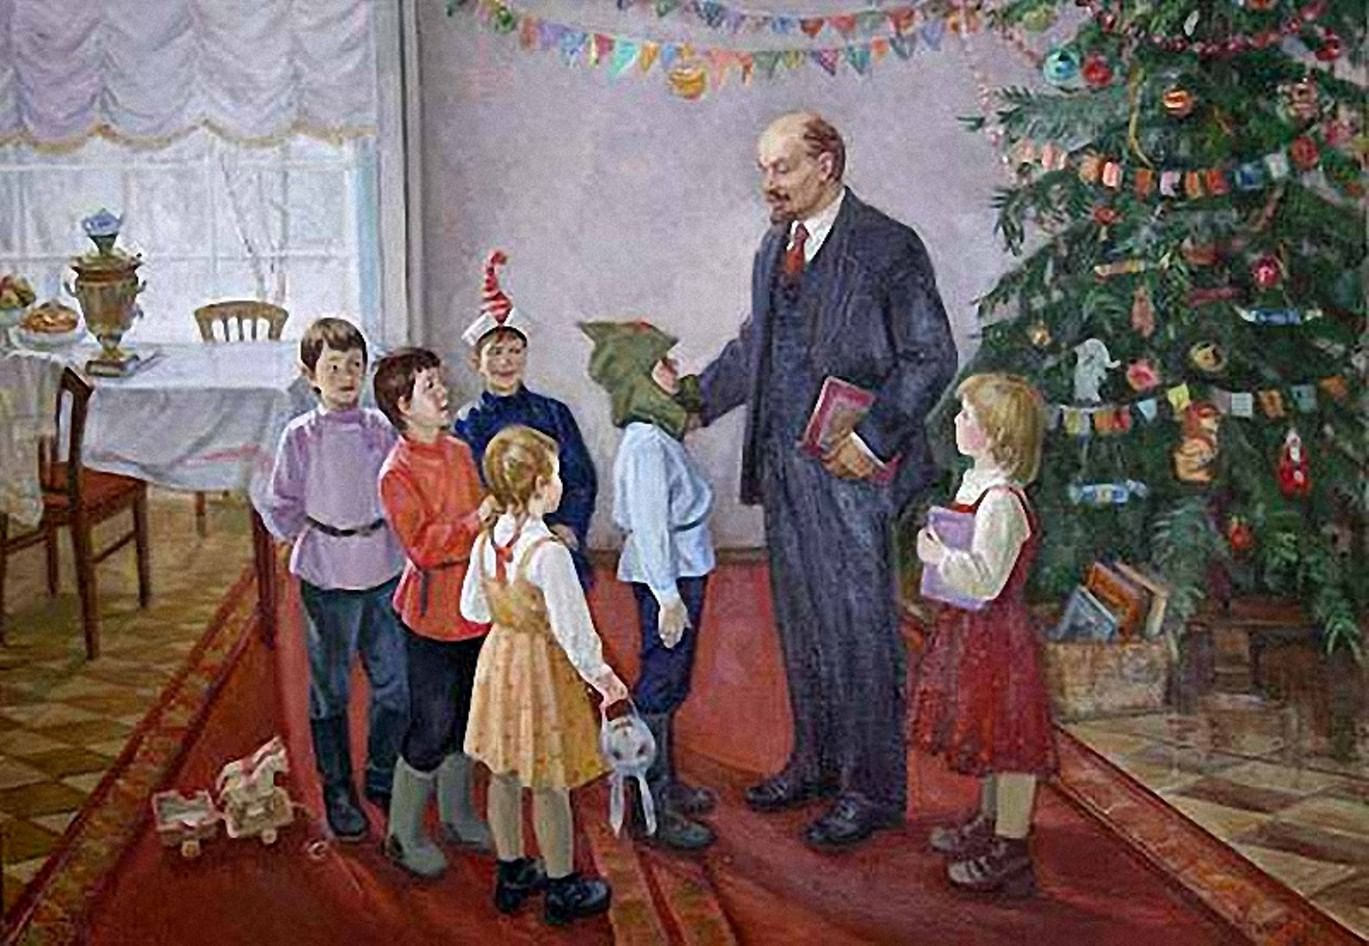 Рождество в Стране Советов. Галерея 3